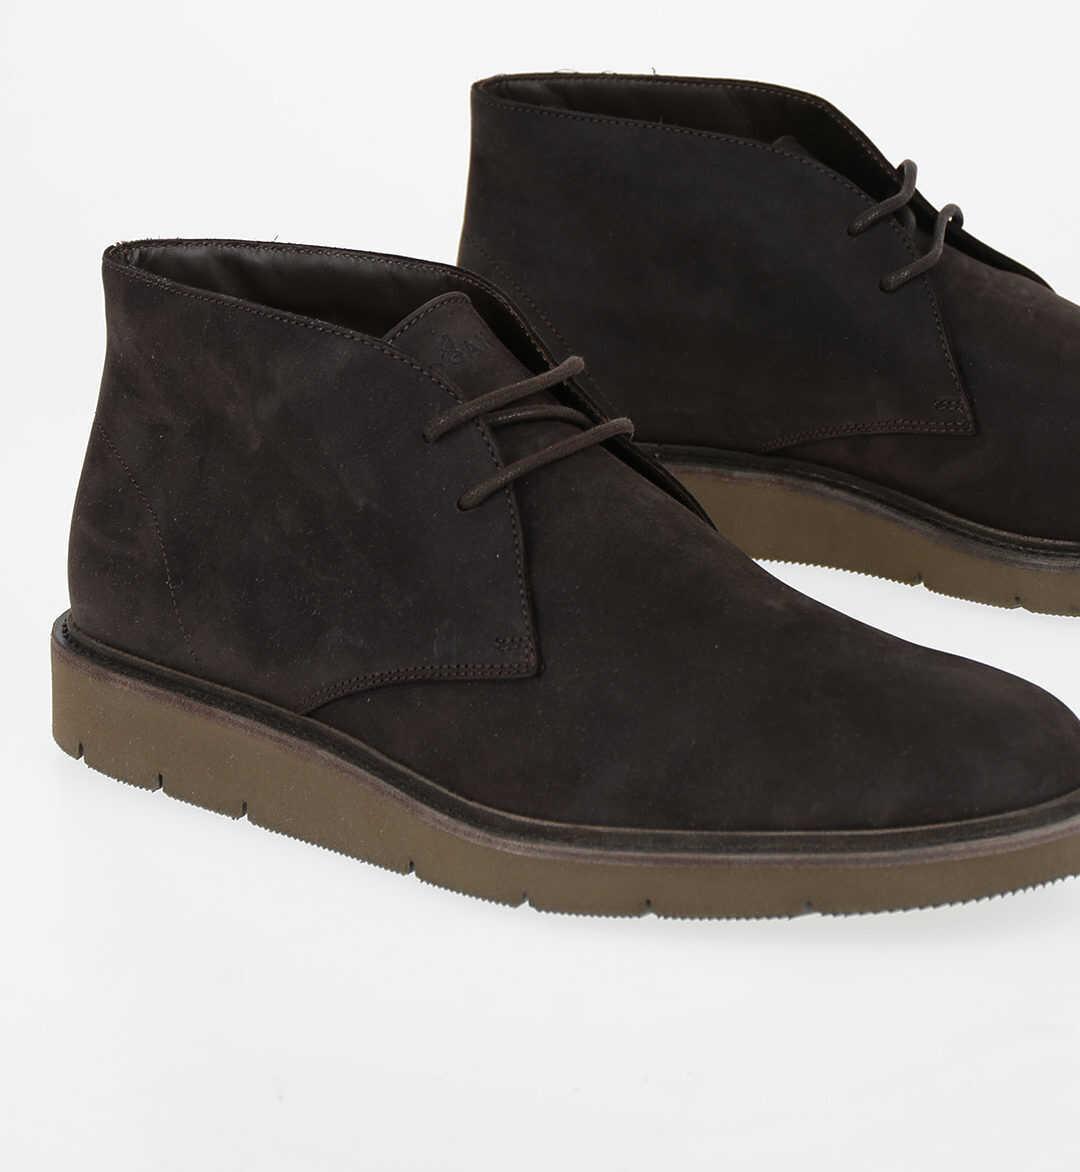 Hogan Suede Desert Boots BROWN